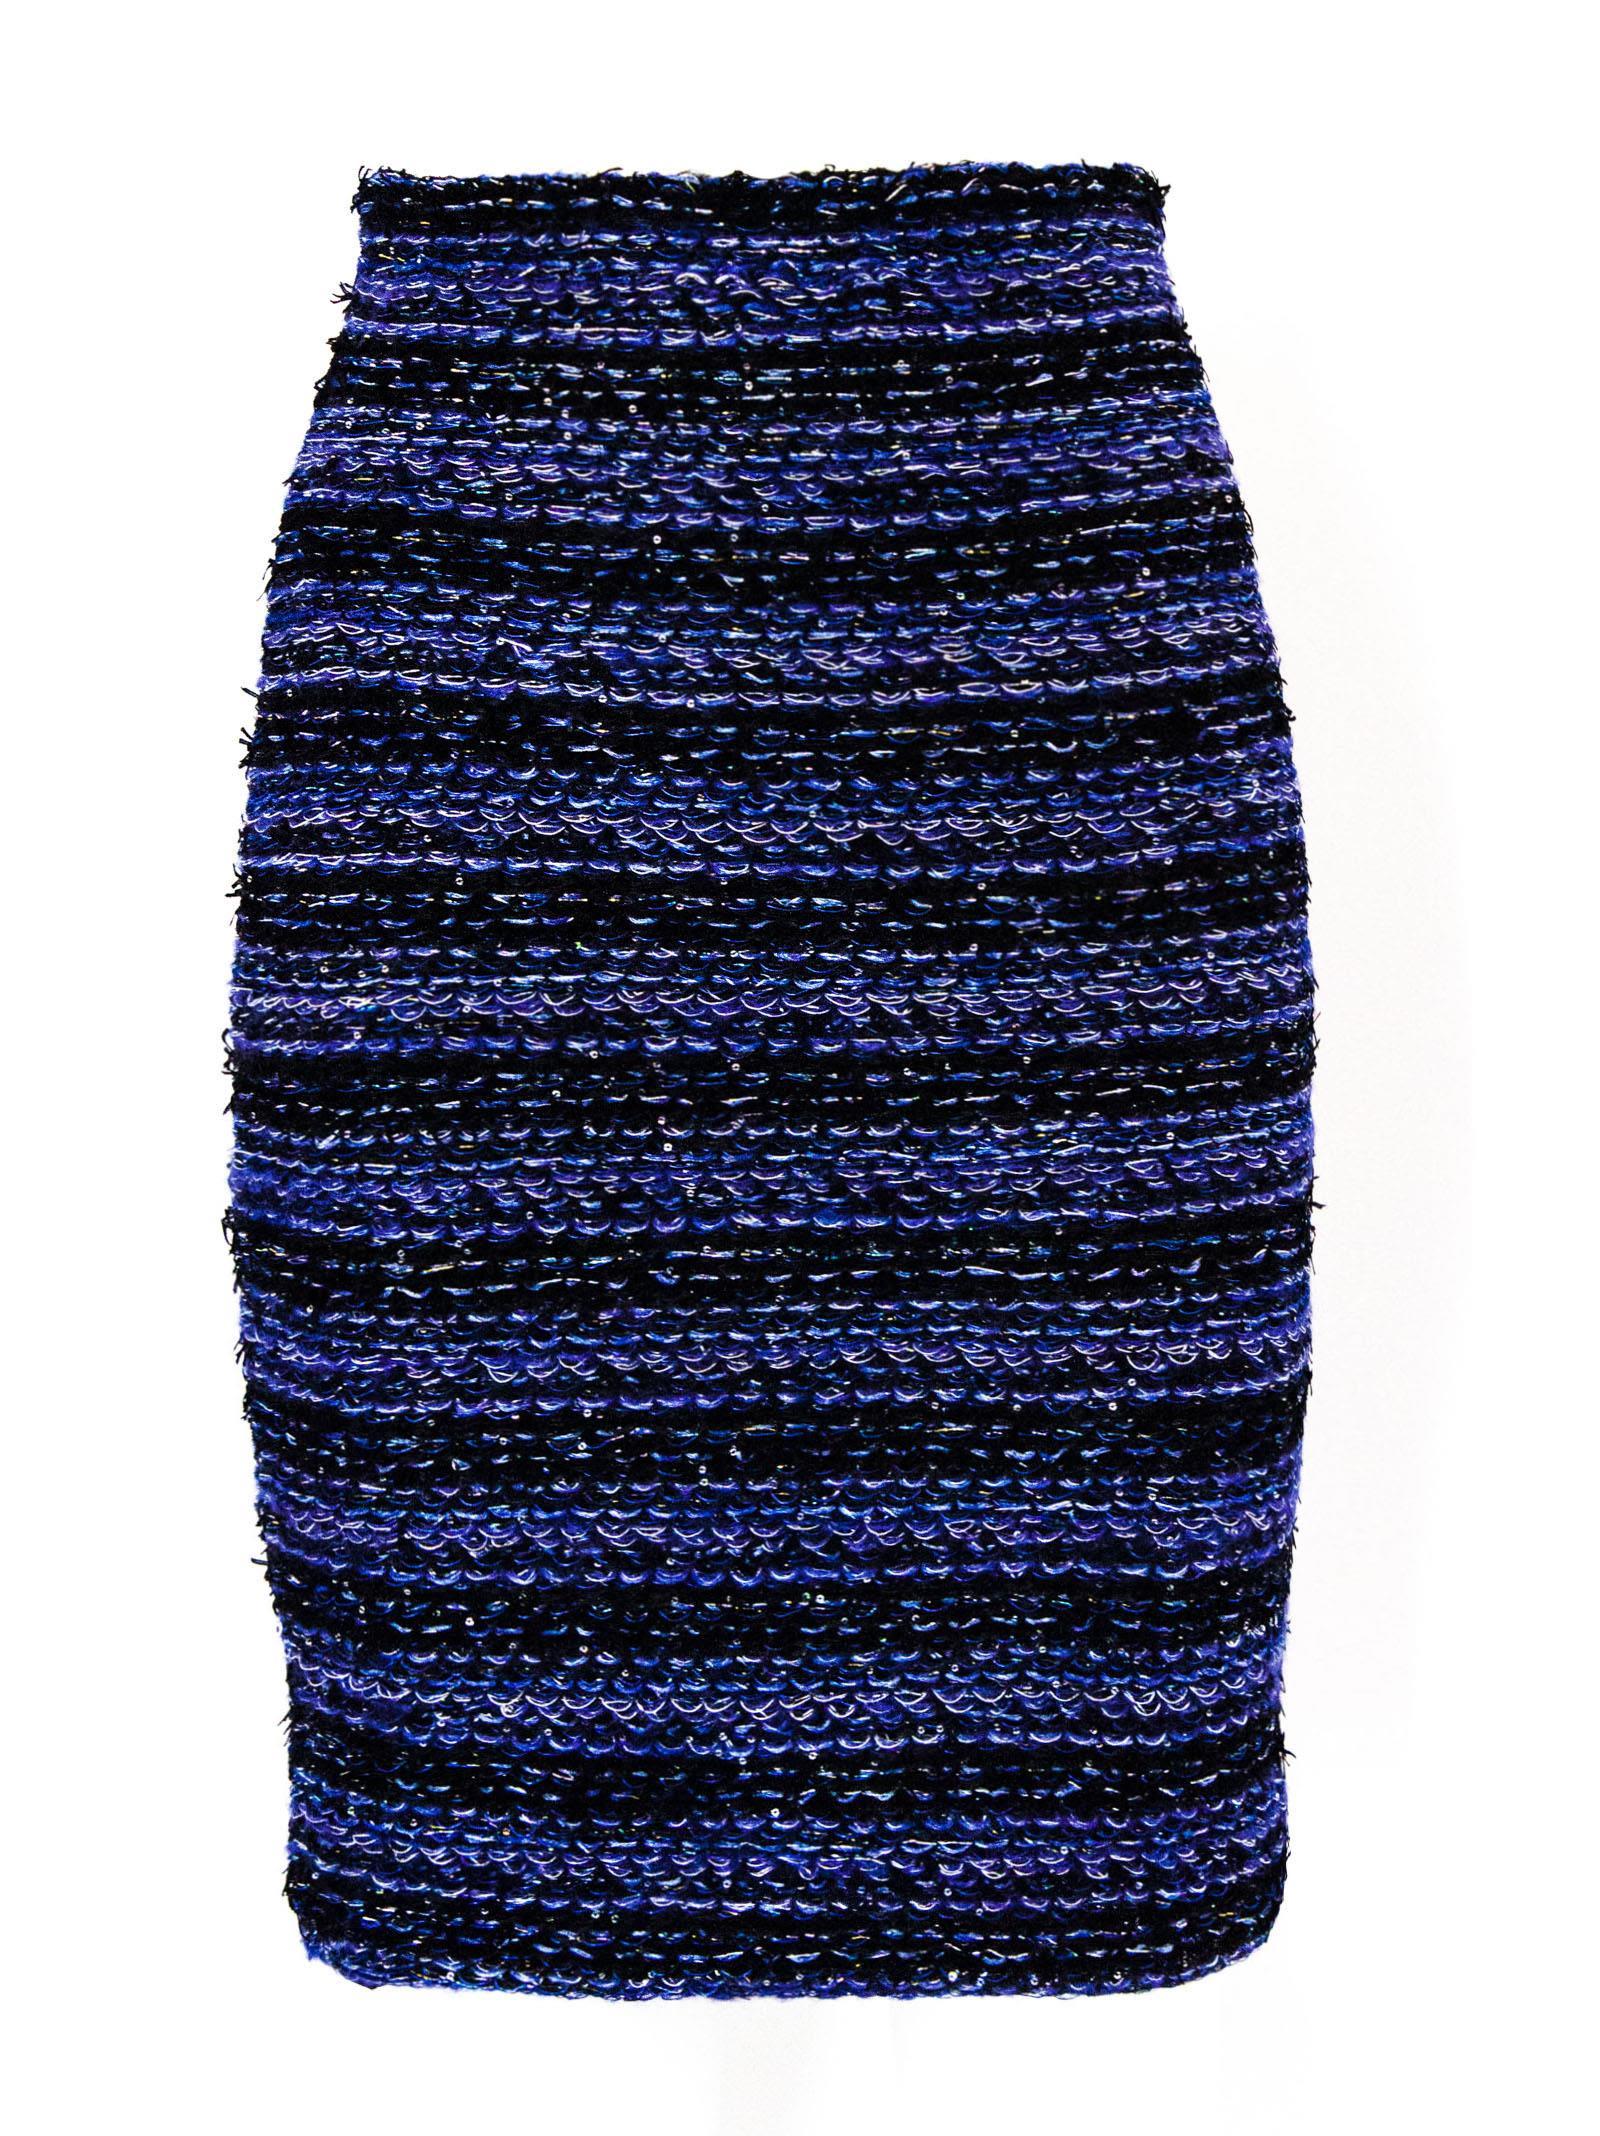 Striped Tweed Pencil Skirt.